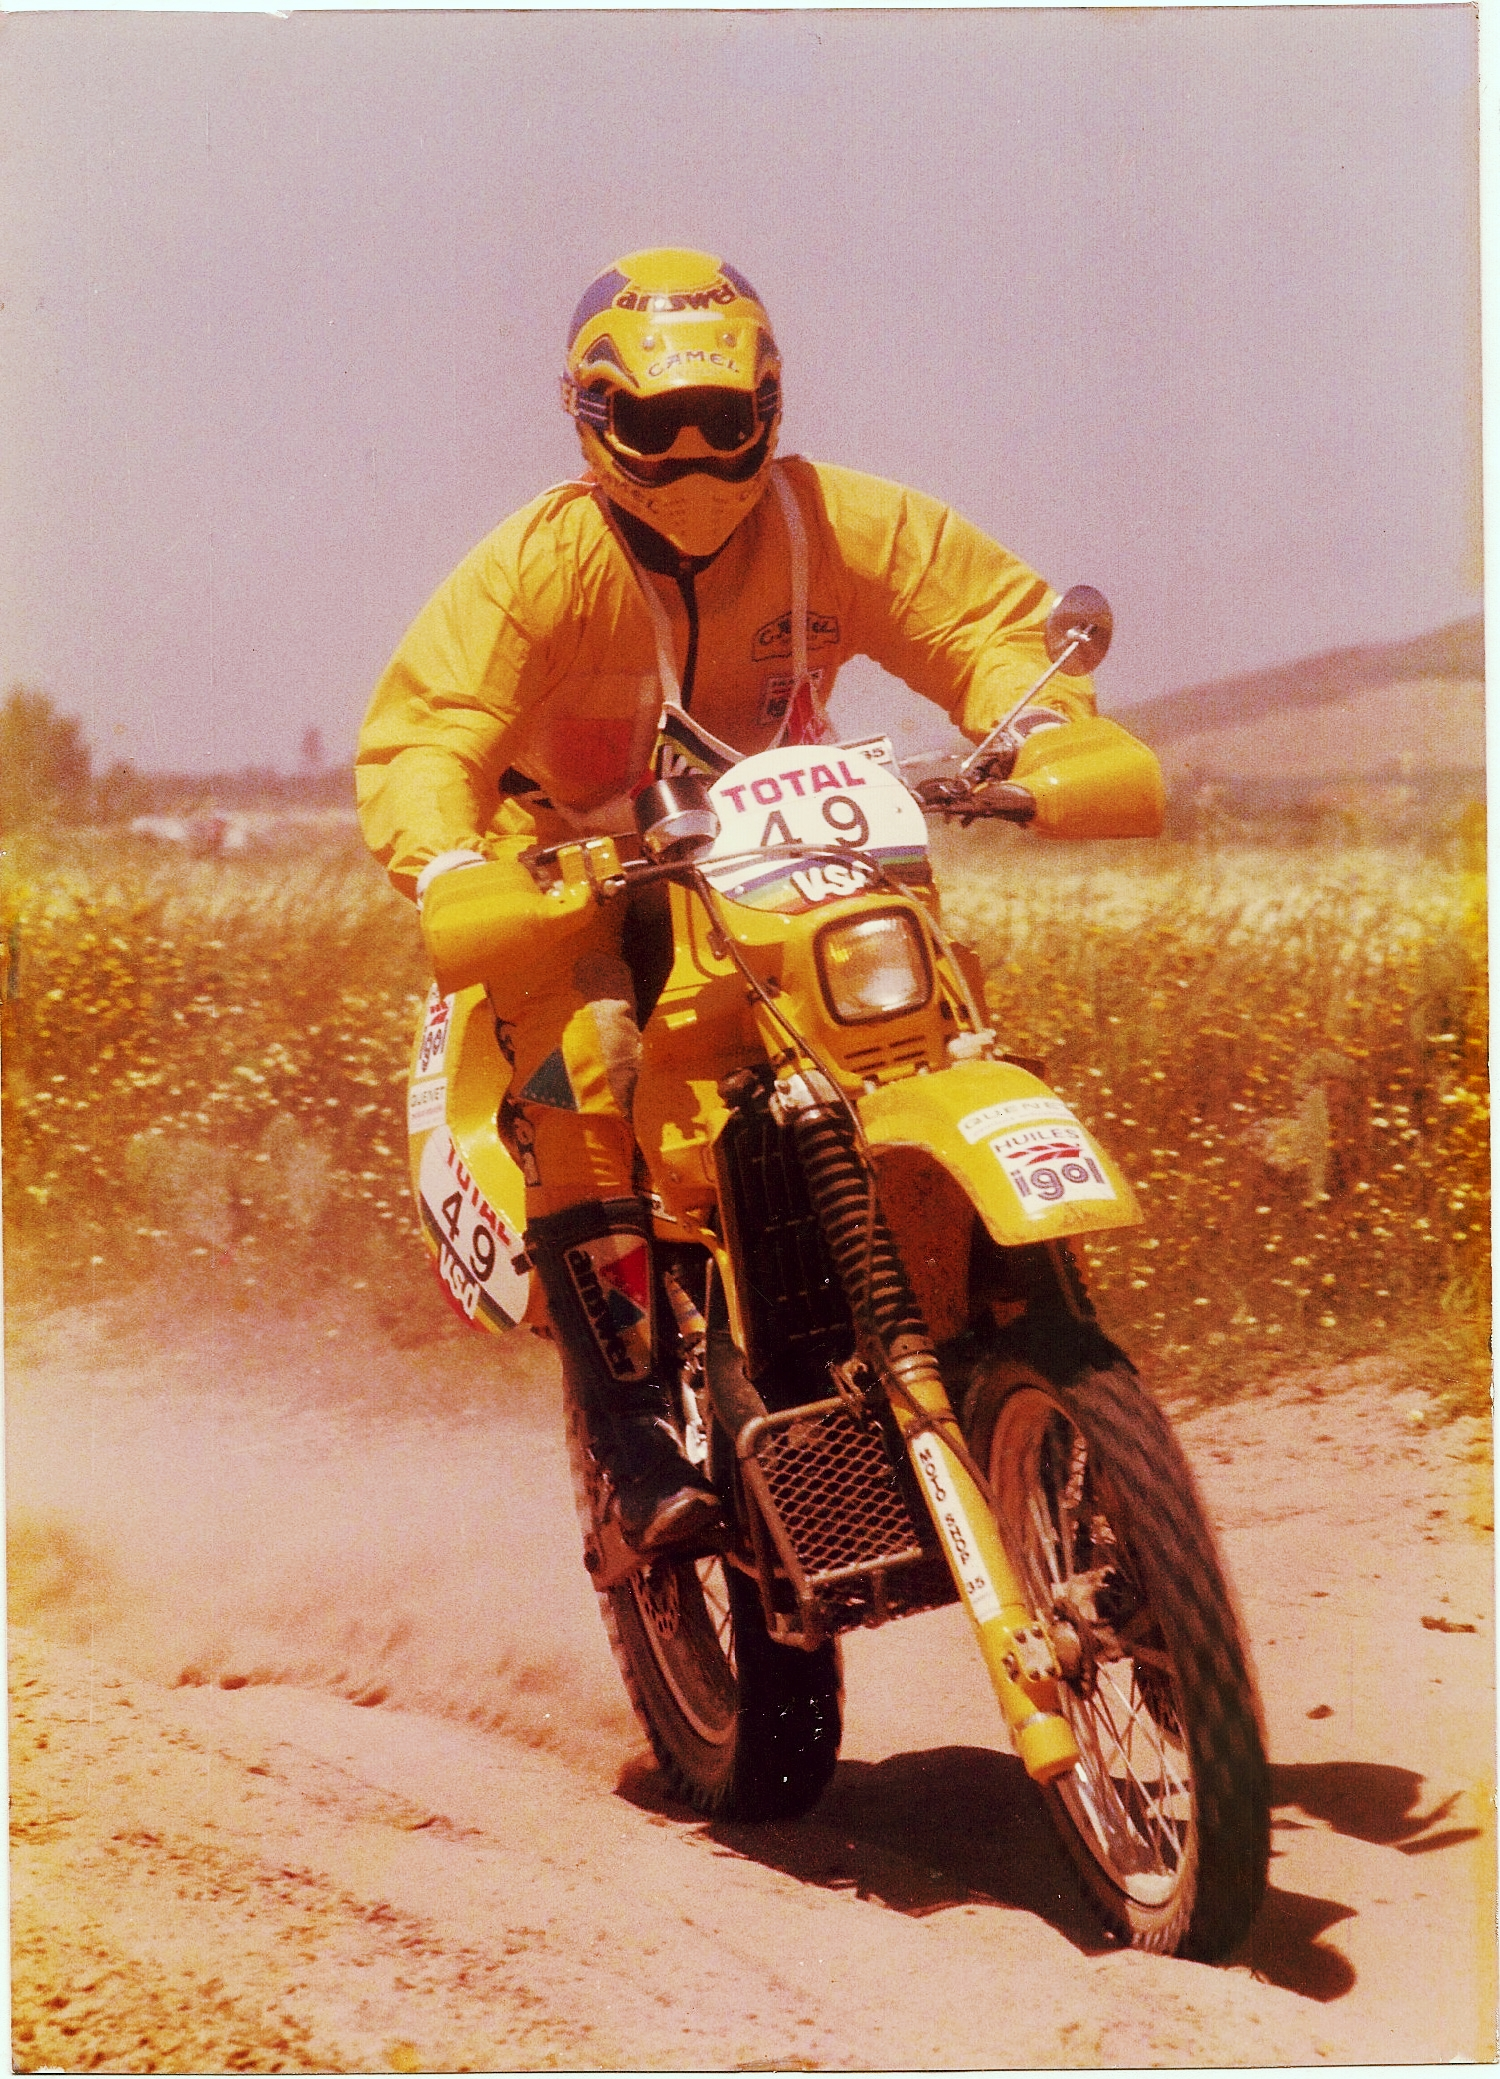 sahara heat 1987 full movie